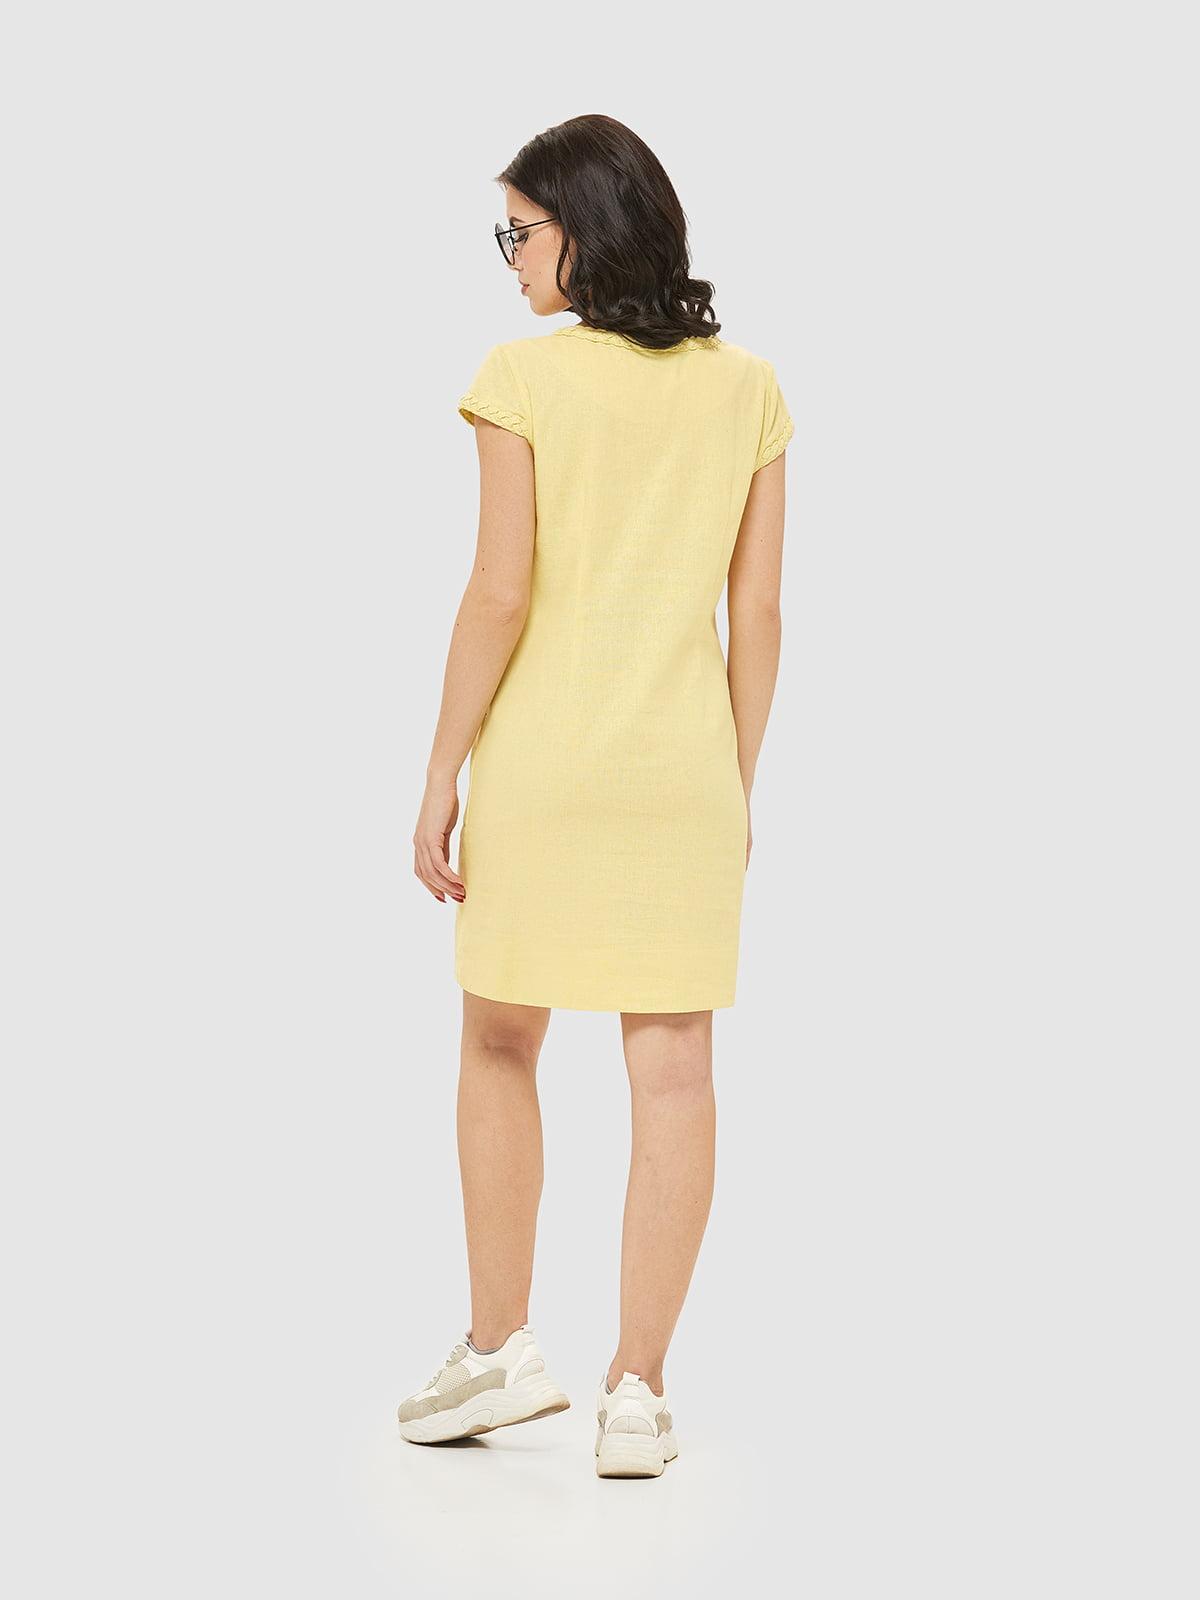 Сукня жовта   5075475   фото 2